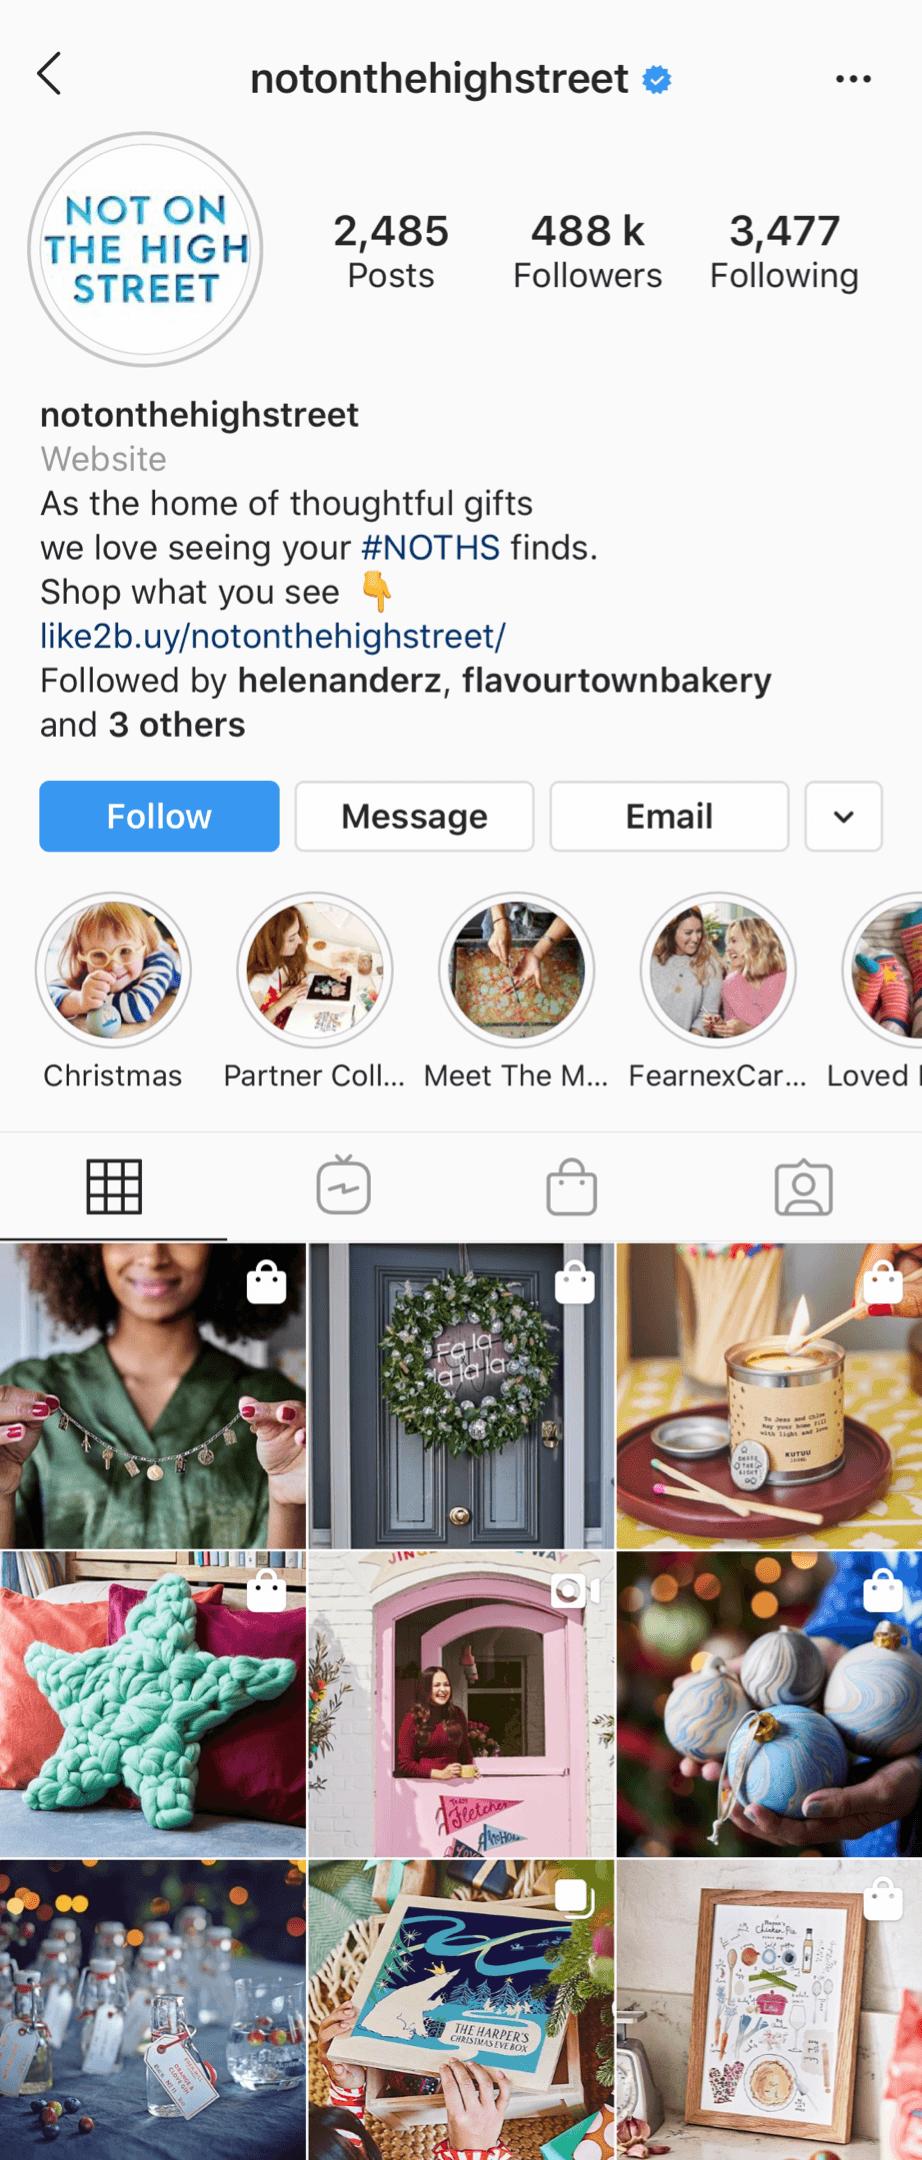 @notonthehighstreet Instagram profile